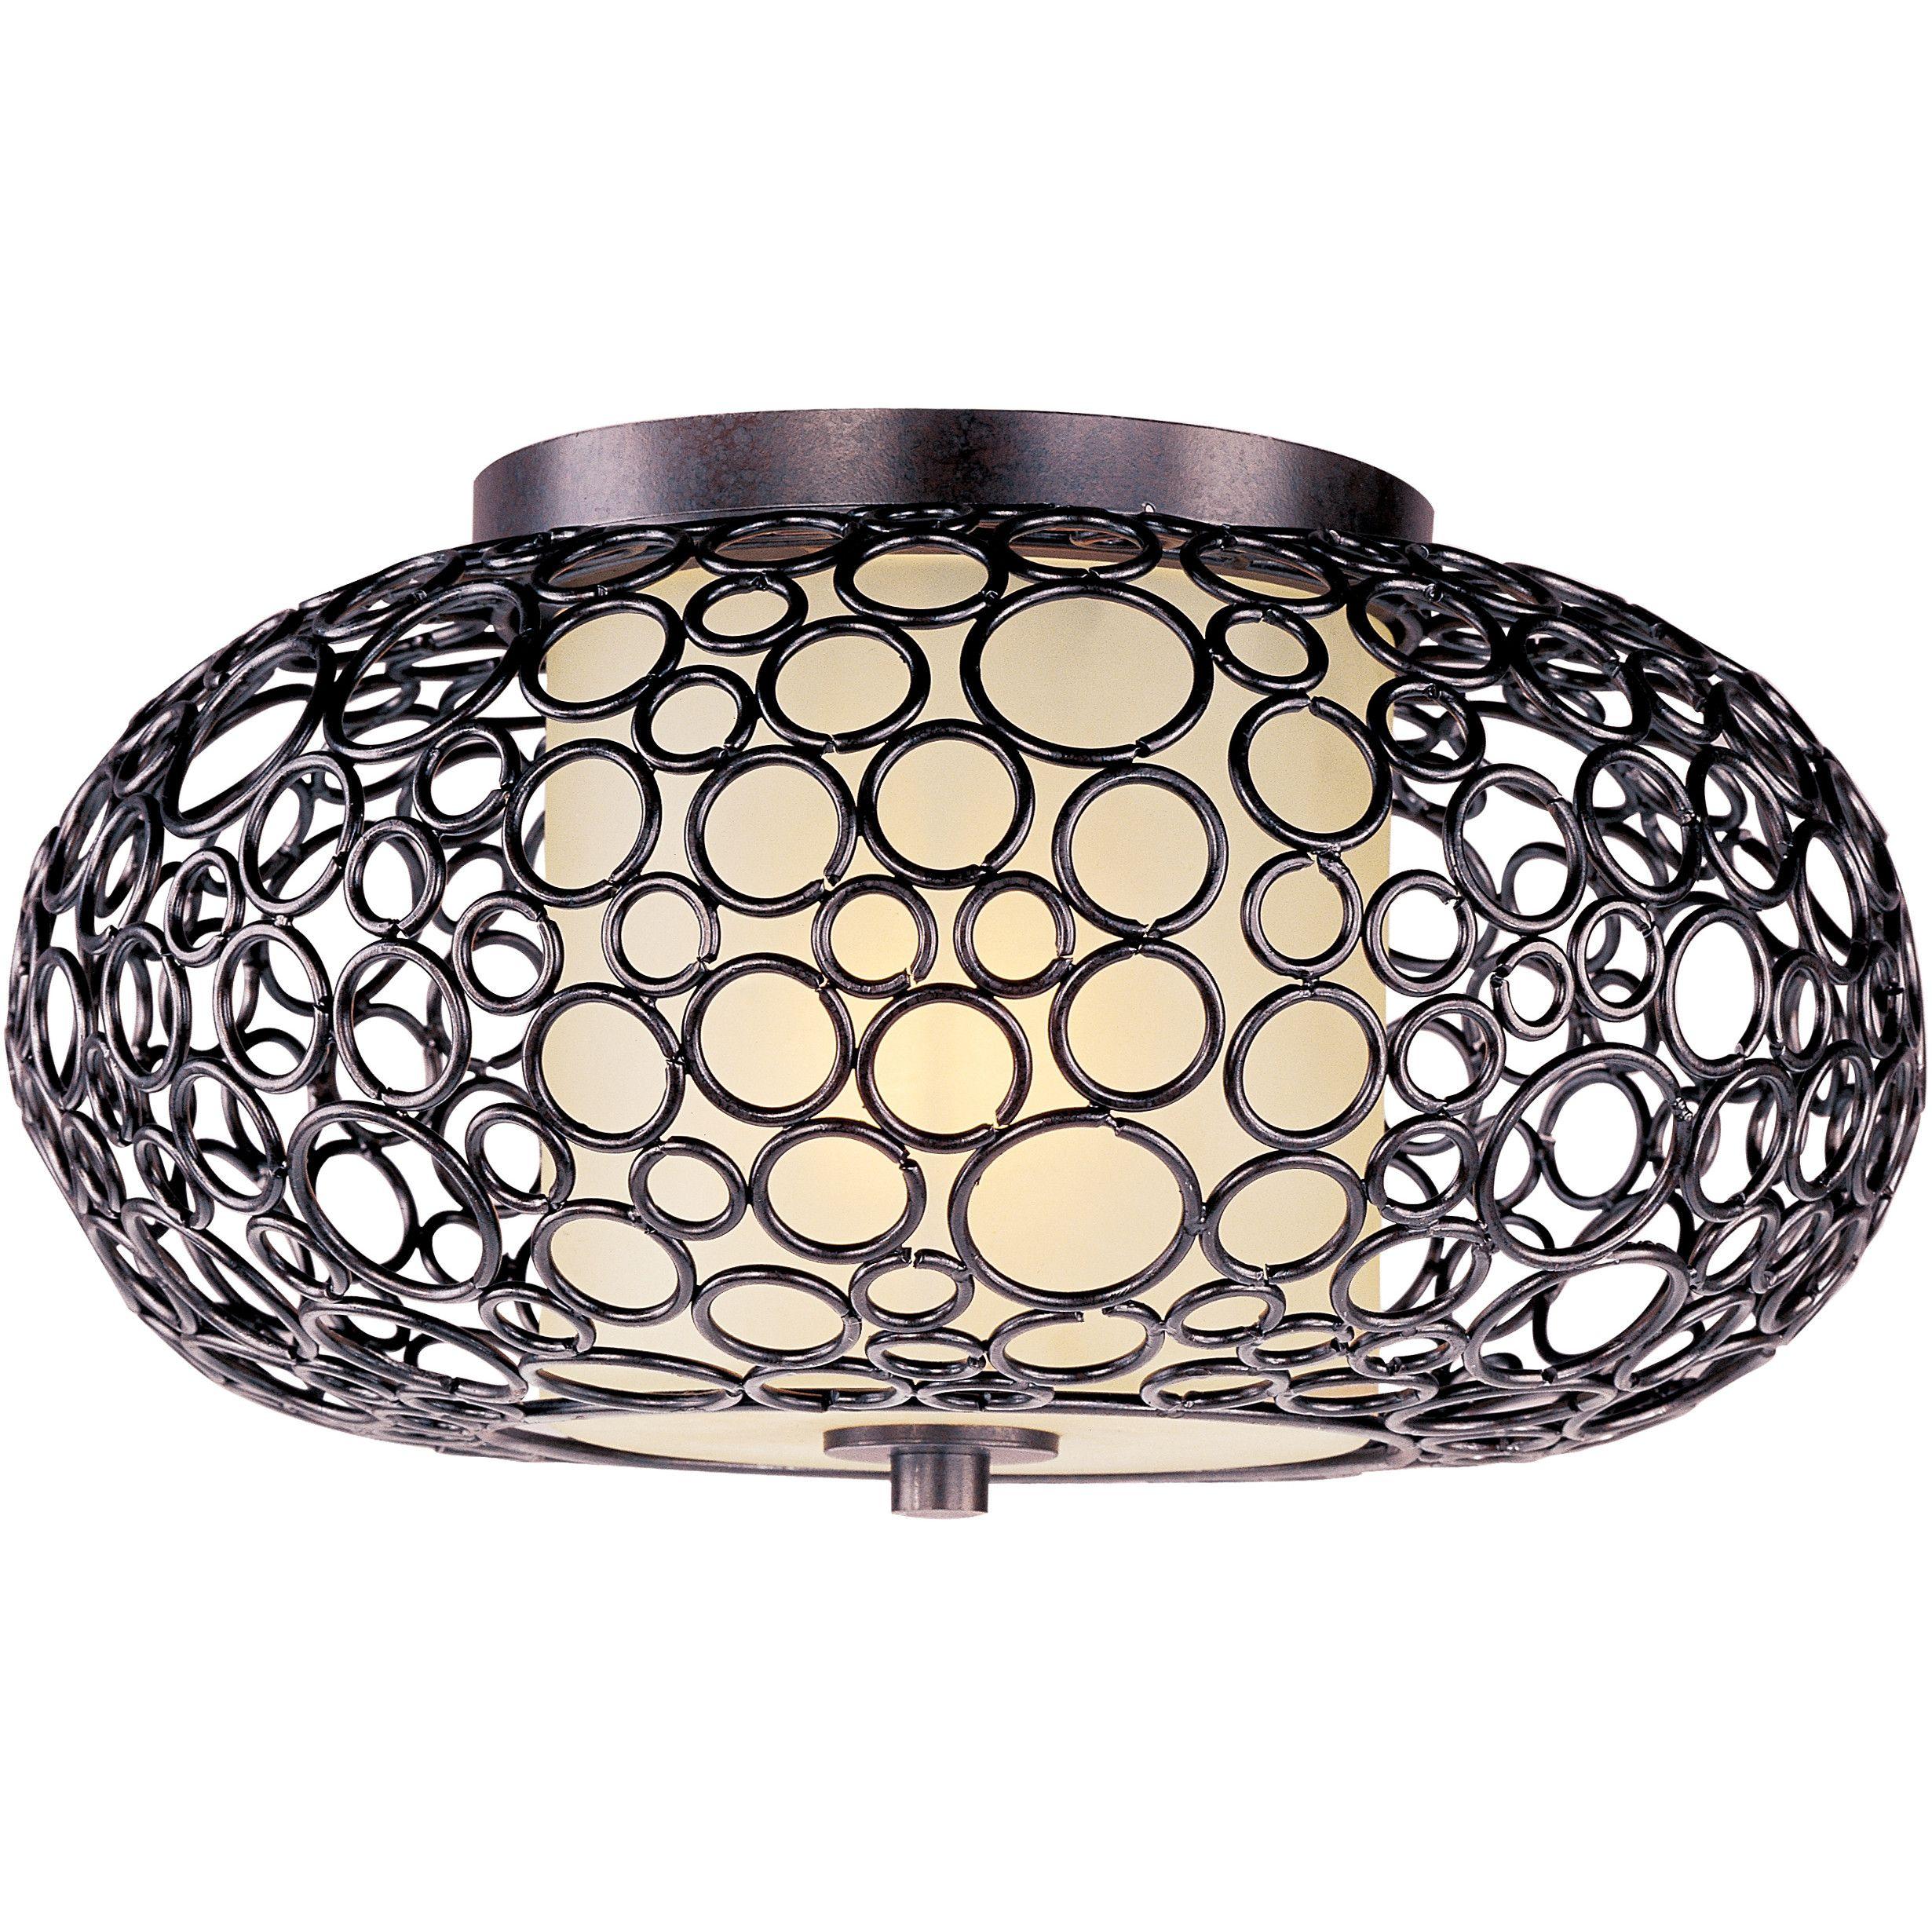 light in patrofi veloclub mounted suspended ceilings tiles mount lights grid flush co ceiling drop